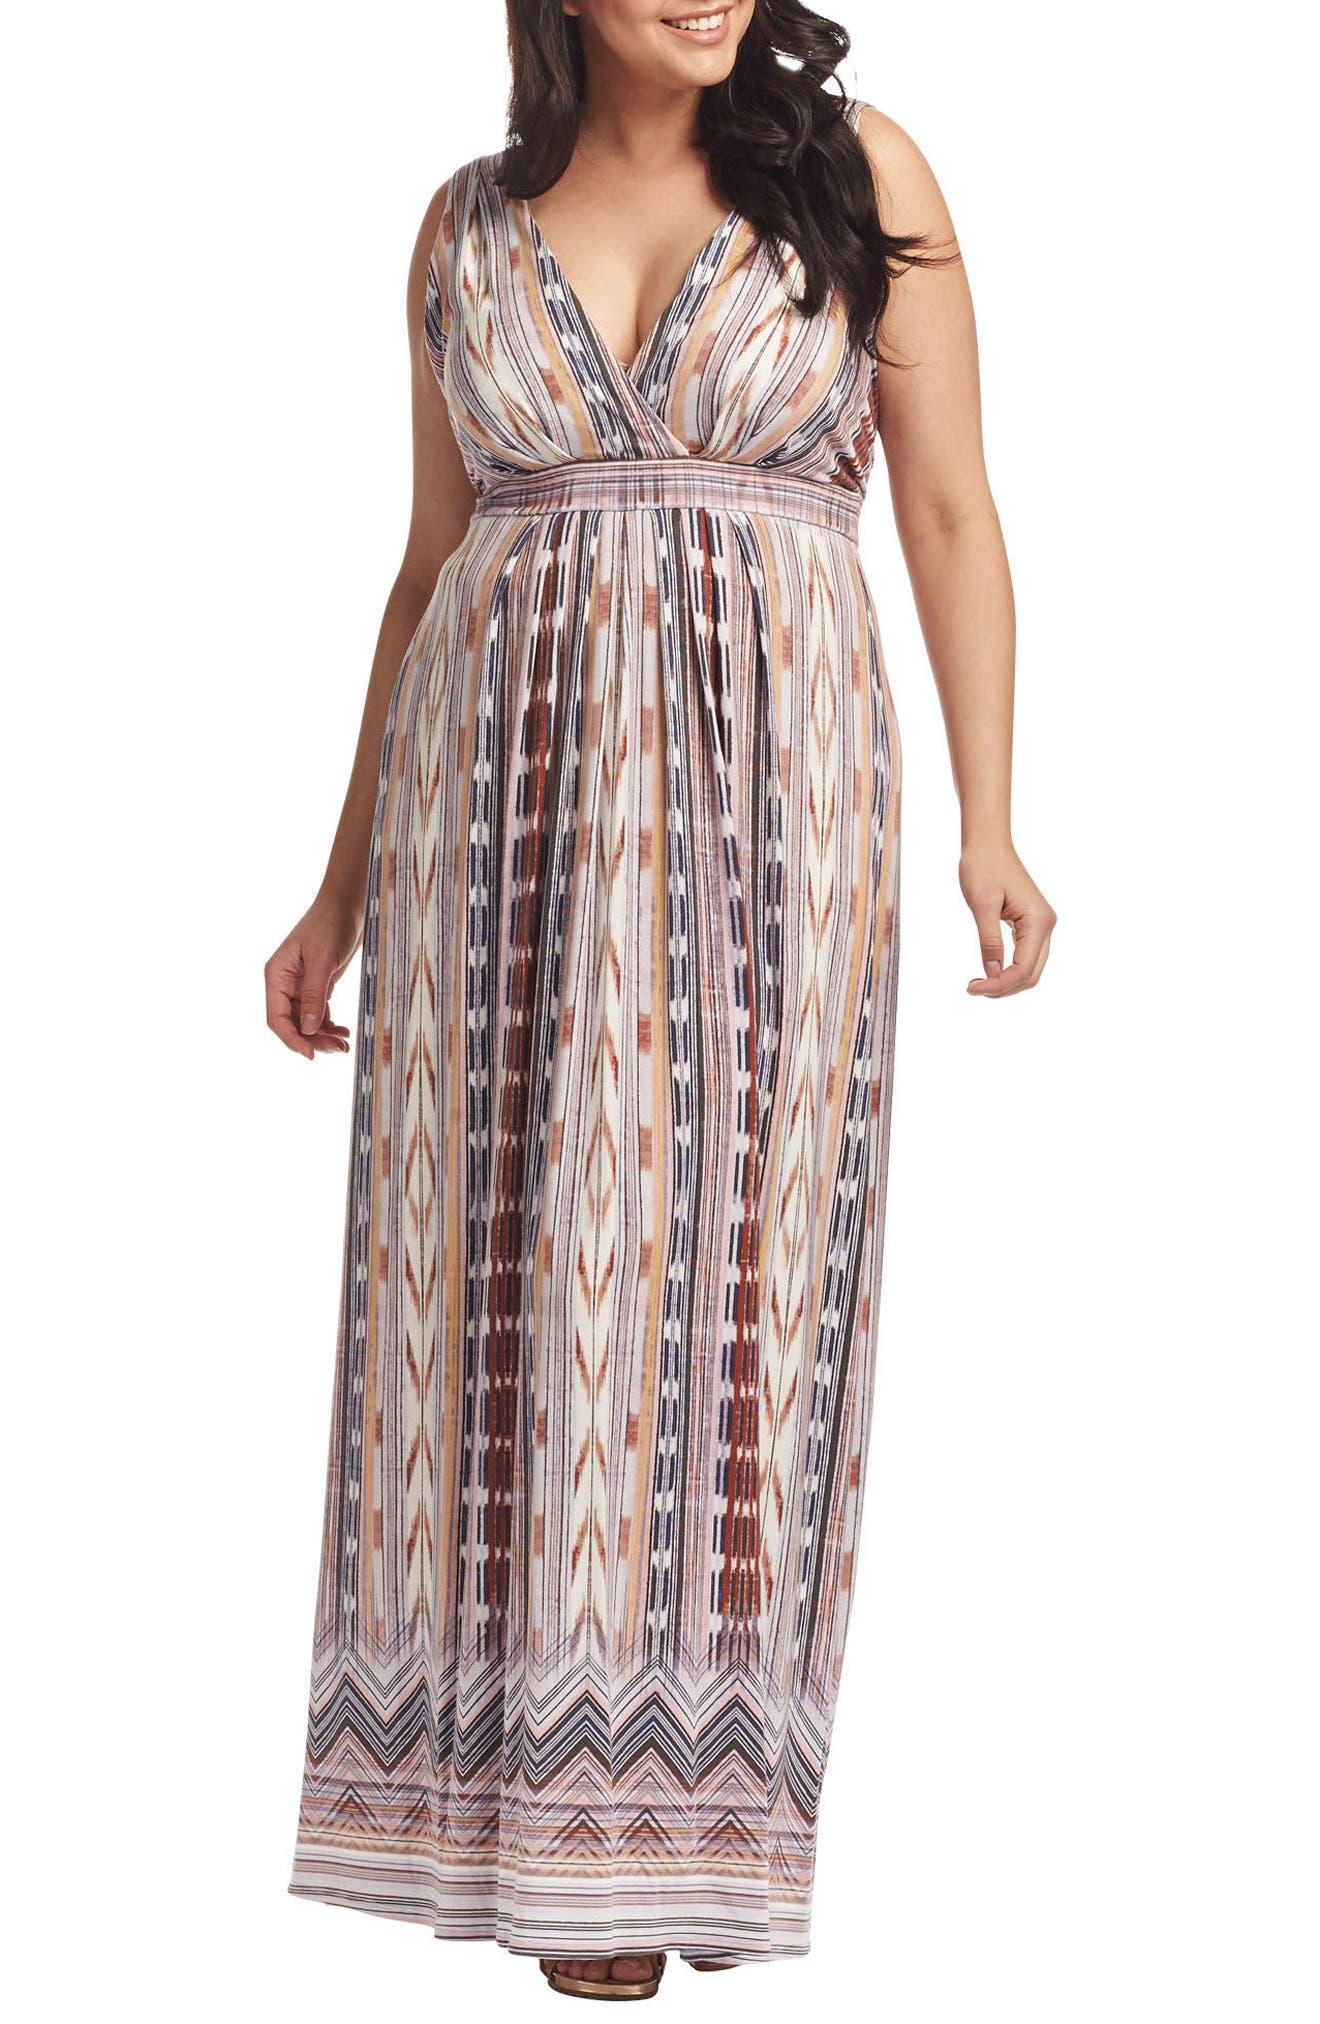 Chloe Empire Waist Maxi Dress,                             Main thumbnail 19, color,